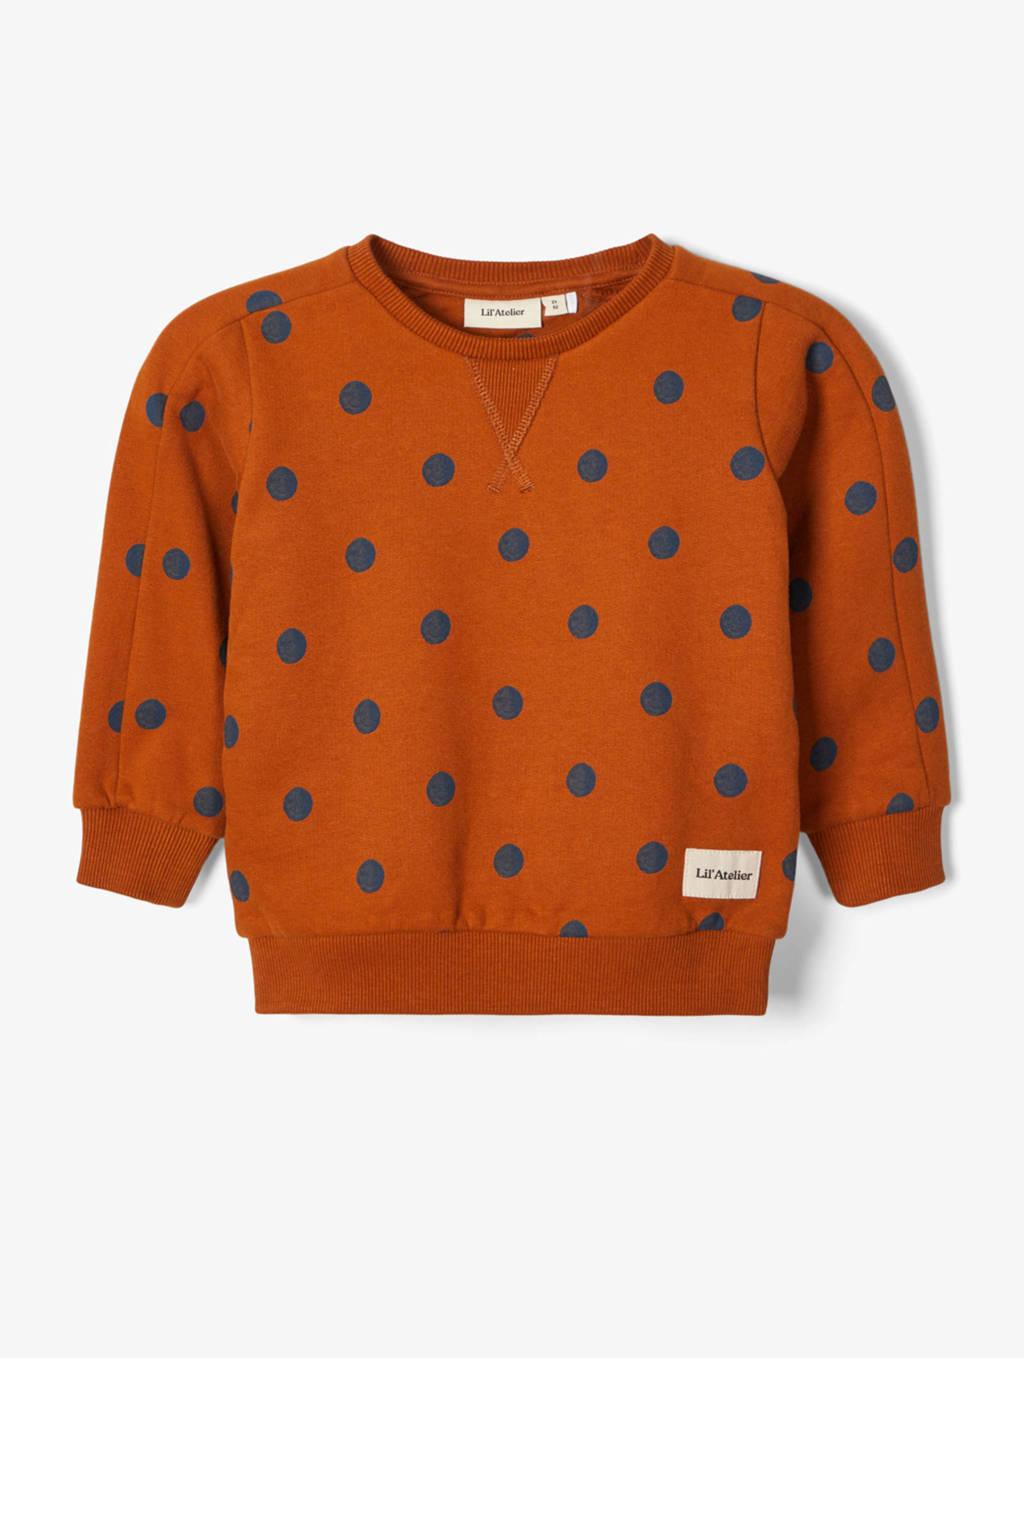 LIL' ATELIER MINI sweater Elmo van biologisch katoen donker oranje/donkerblauw, Donker oranje/donkerblauw